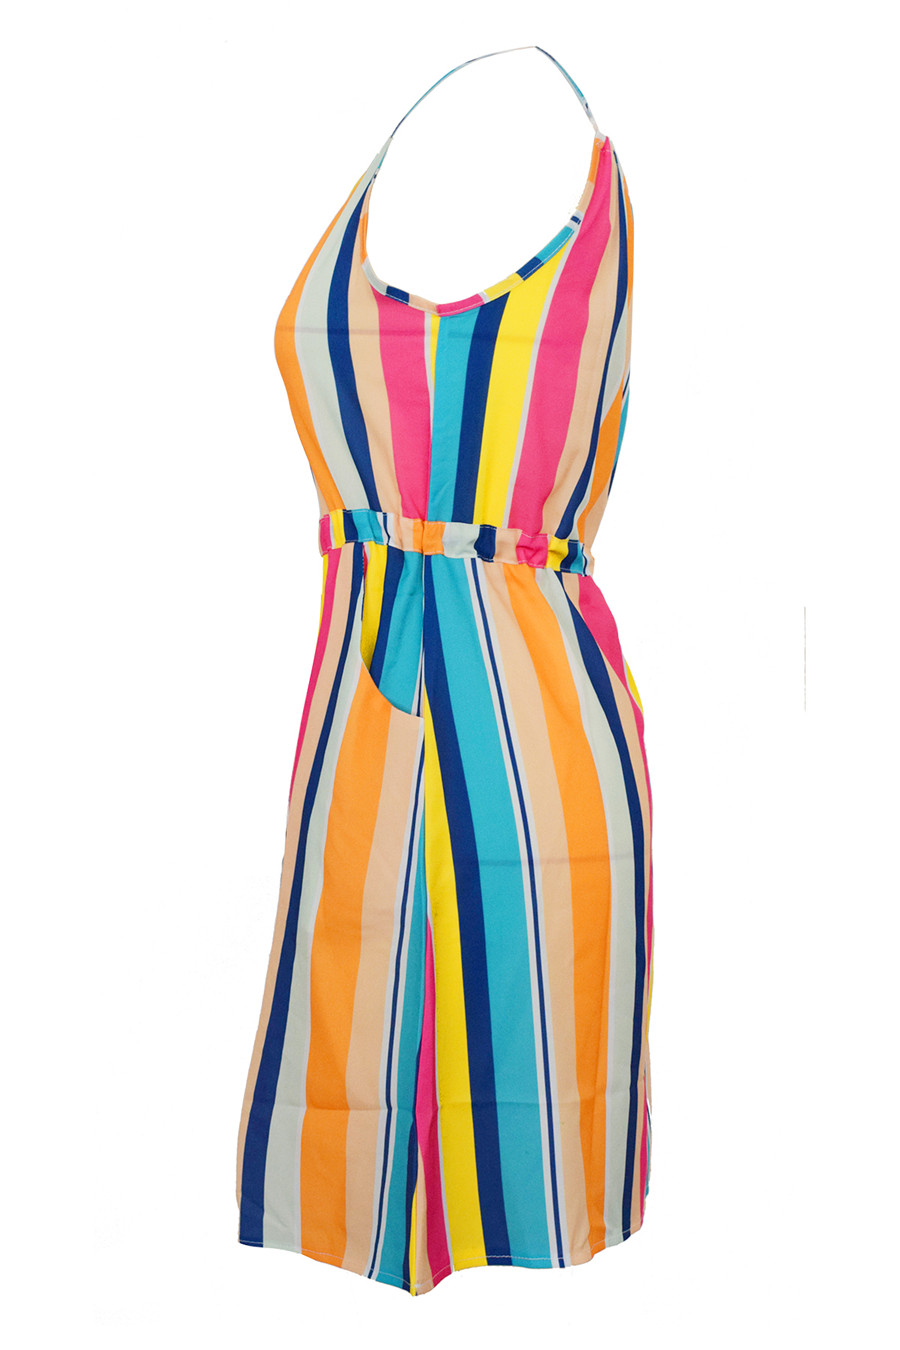 Gladiolus Chiffon Women Summer Dress Spaghetti Strap Floral Print Pocket Sexy Bohemian Beach Dress 2019 Short Ladies Dresses (27)